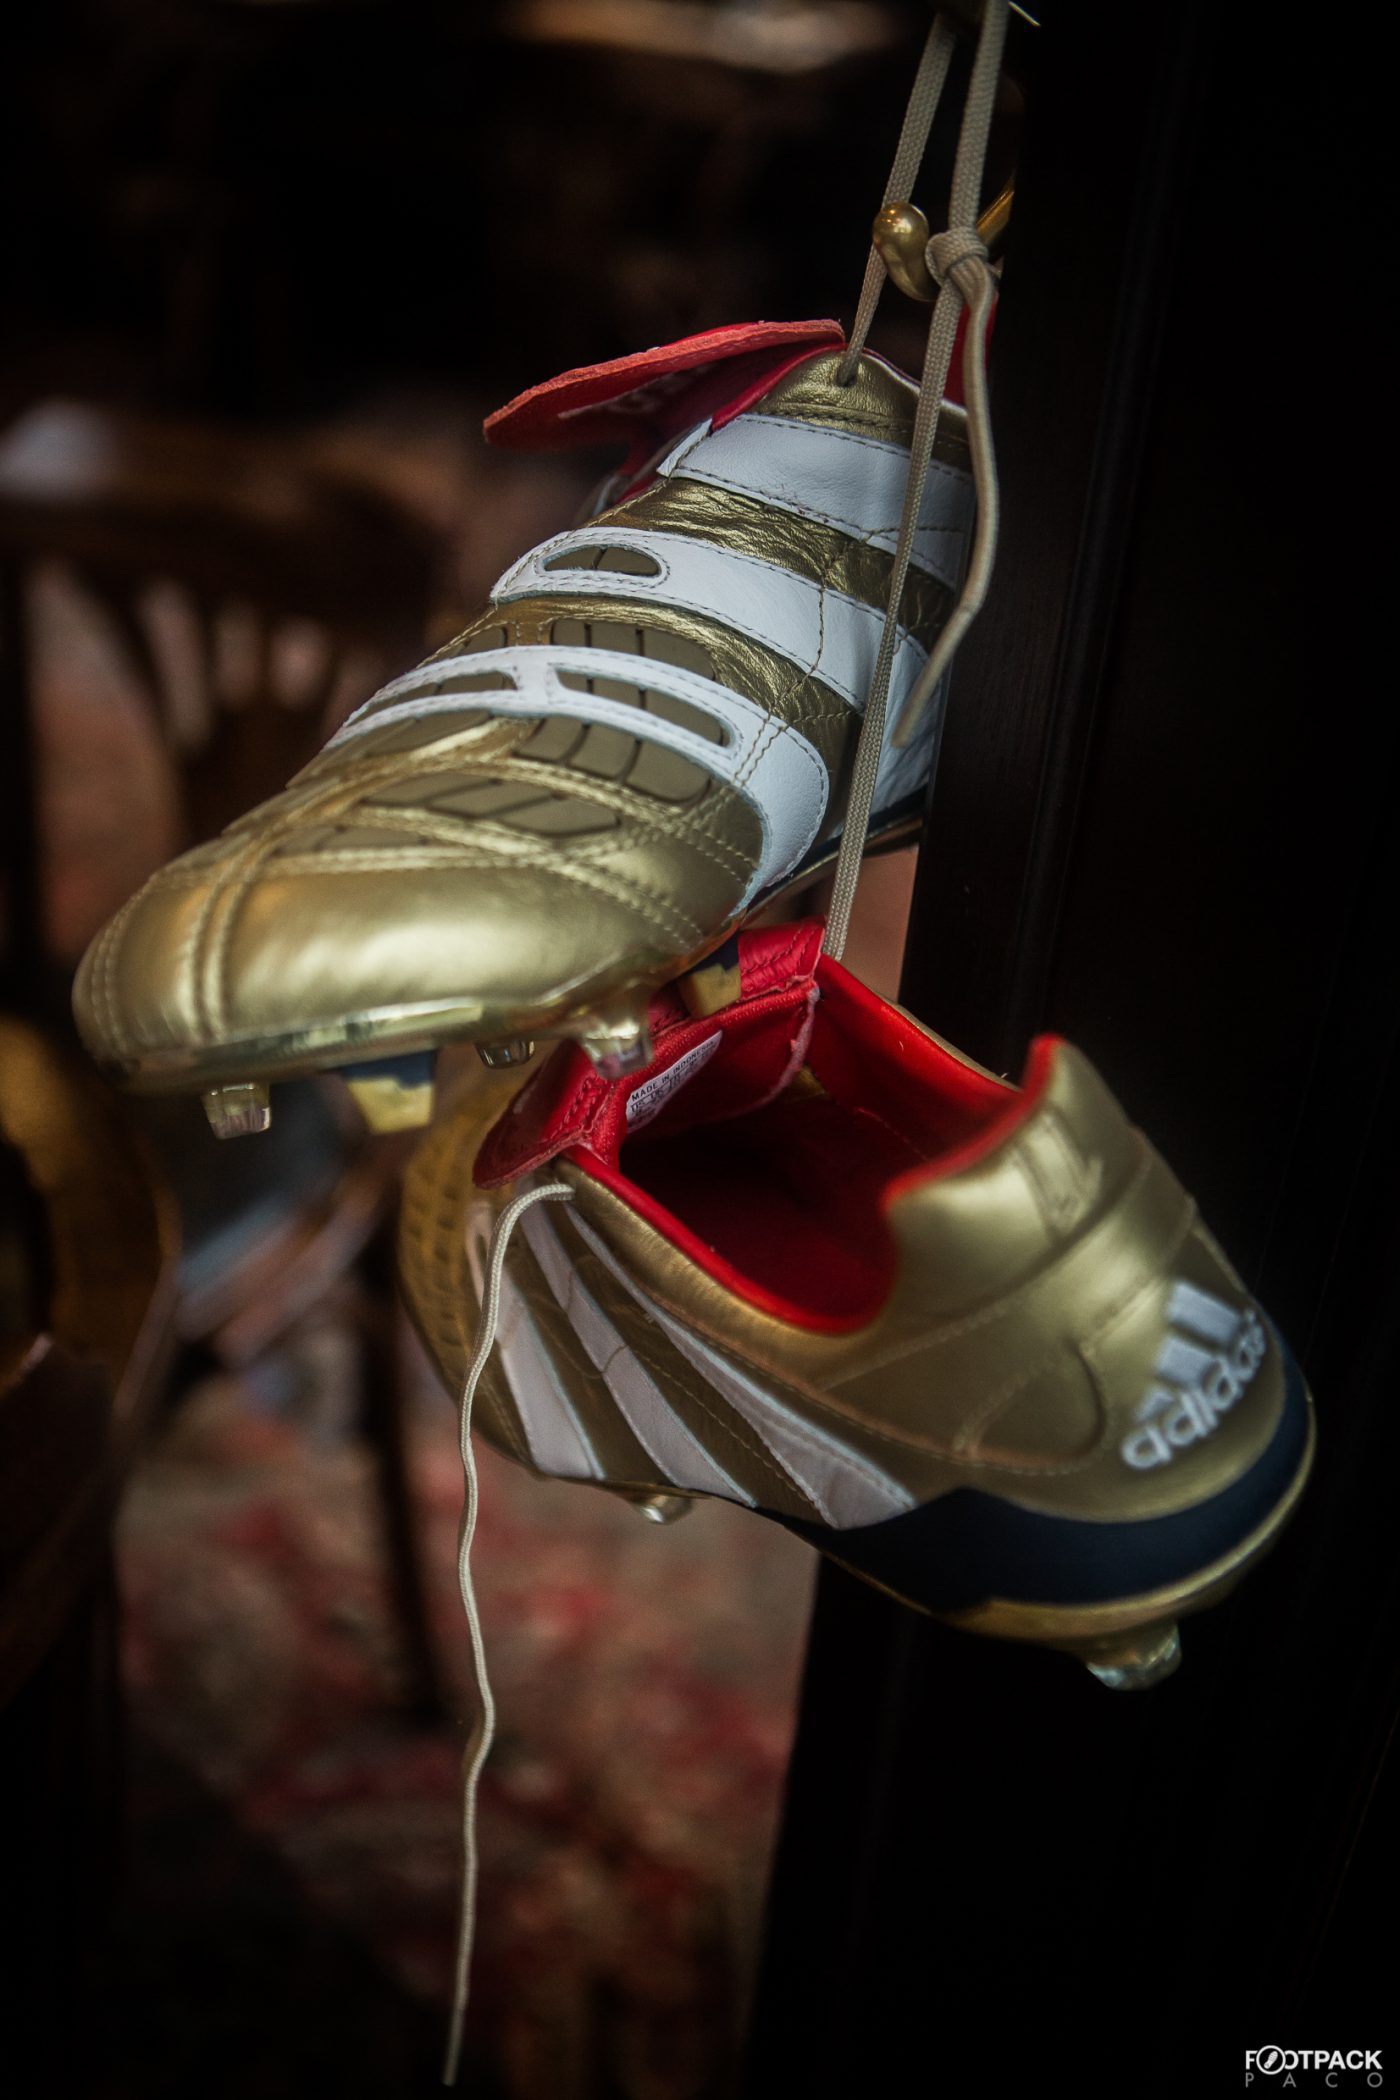 adidas-predator-accelerator-zinedine-zidane-collection-limitee-25-ans-predator-footpack-1